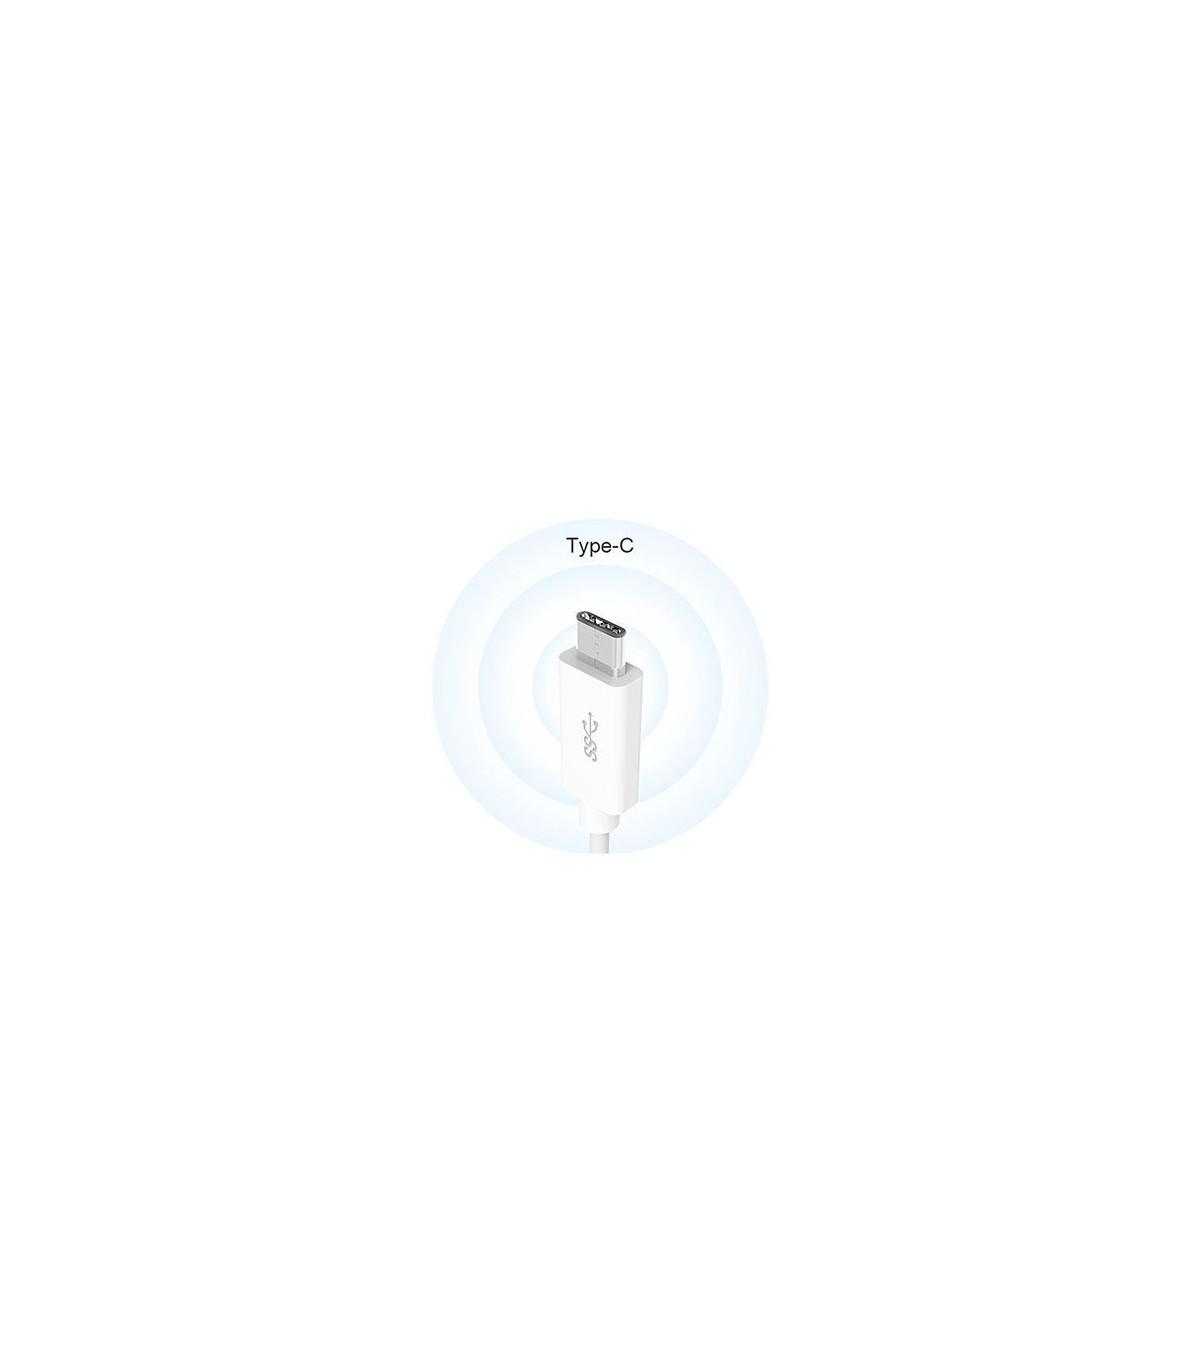 کابل Romoss USB 3.0 Type C